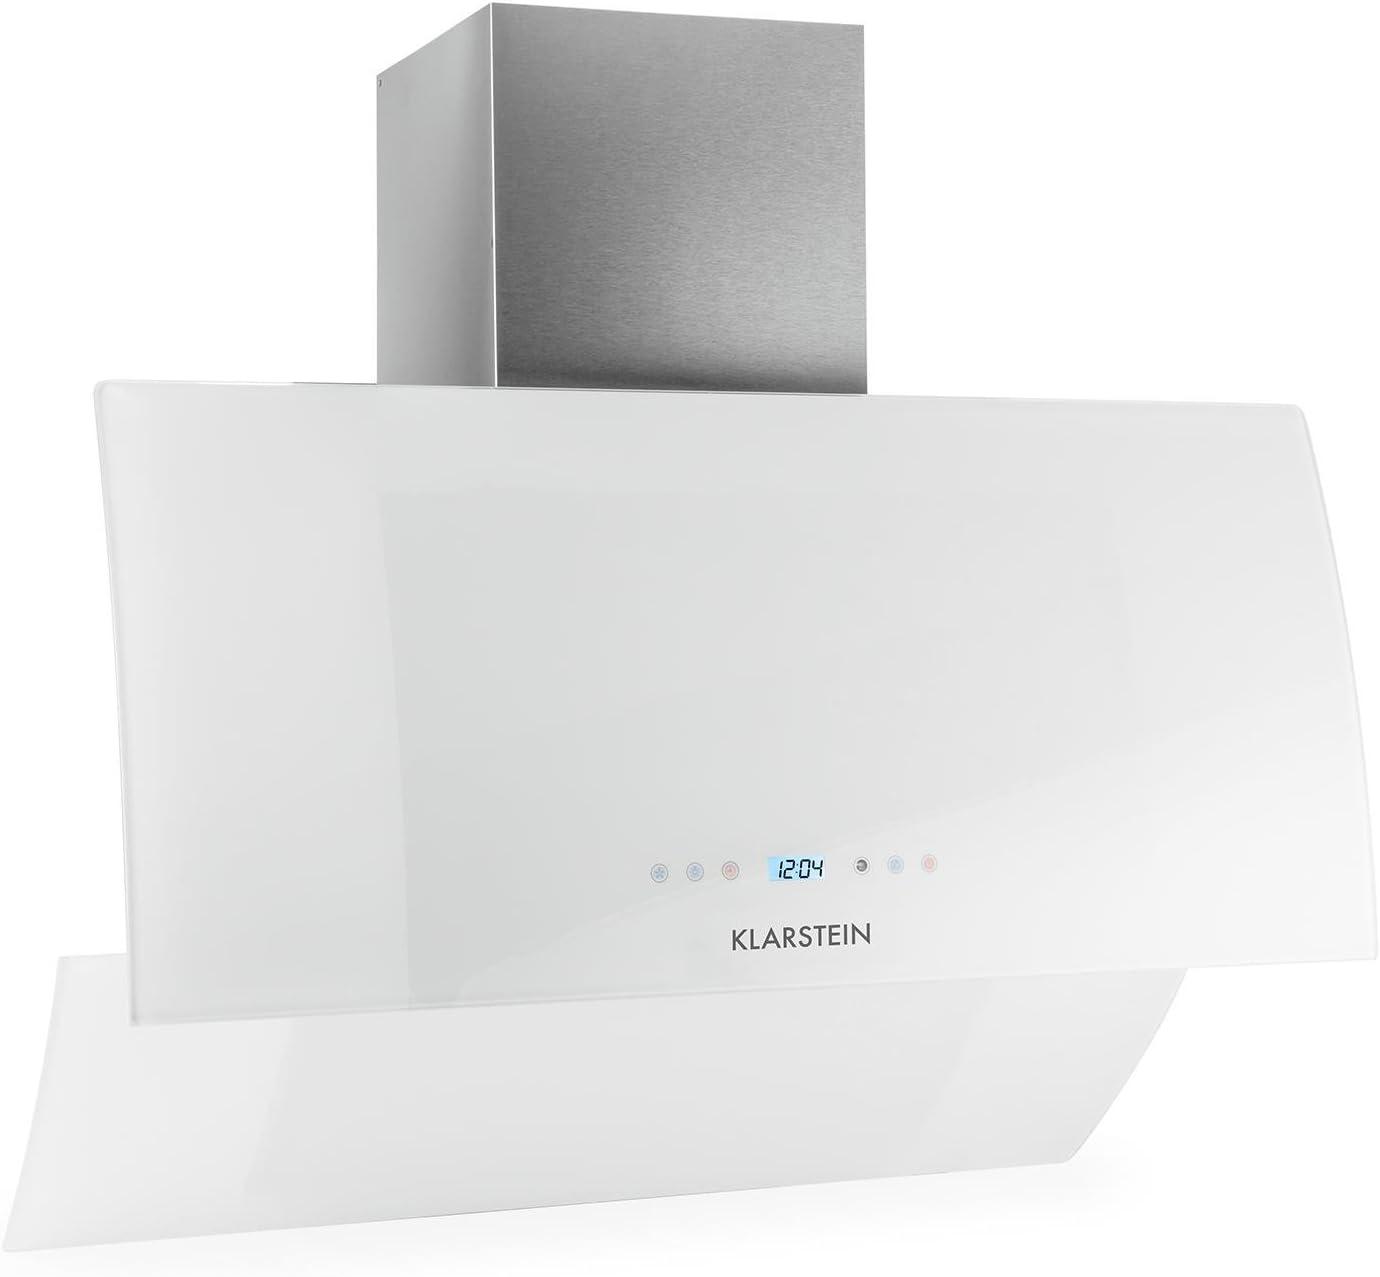 Klarstein RGL – Campana extractora diseño moderno épuré (60 o 90 cm, 700 o 1000 M³, Timer) 90cm - 600m³ blanco: Amazon.es: Hogar